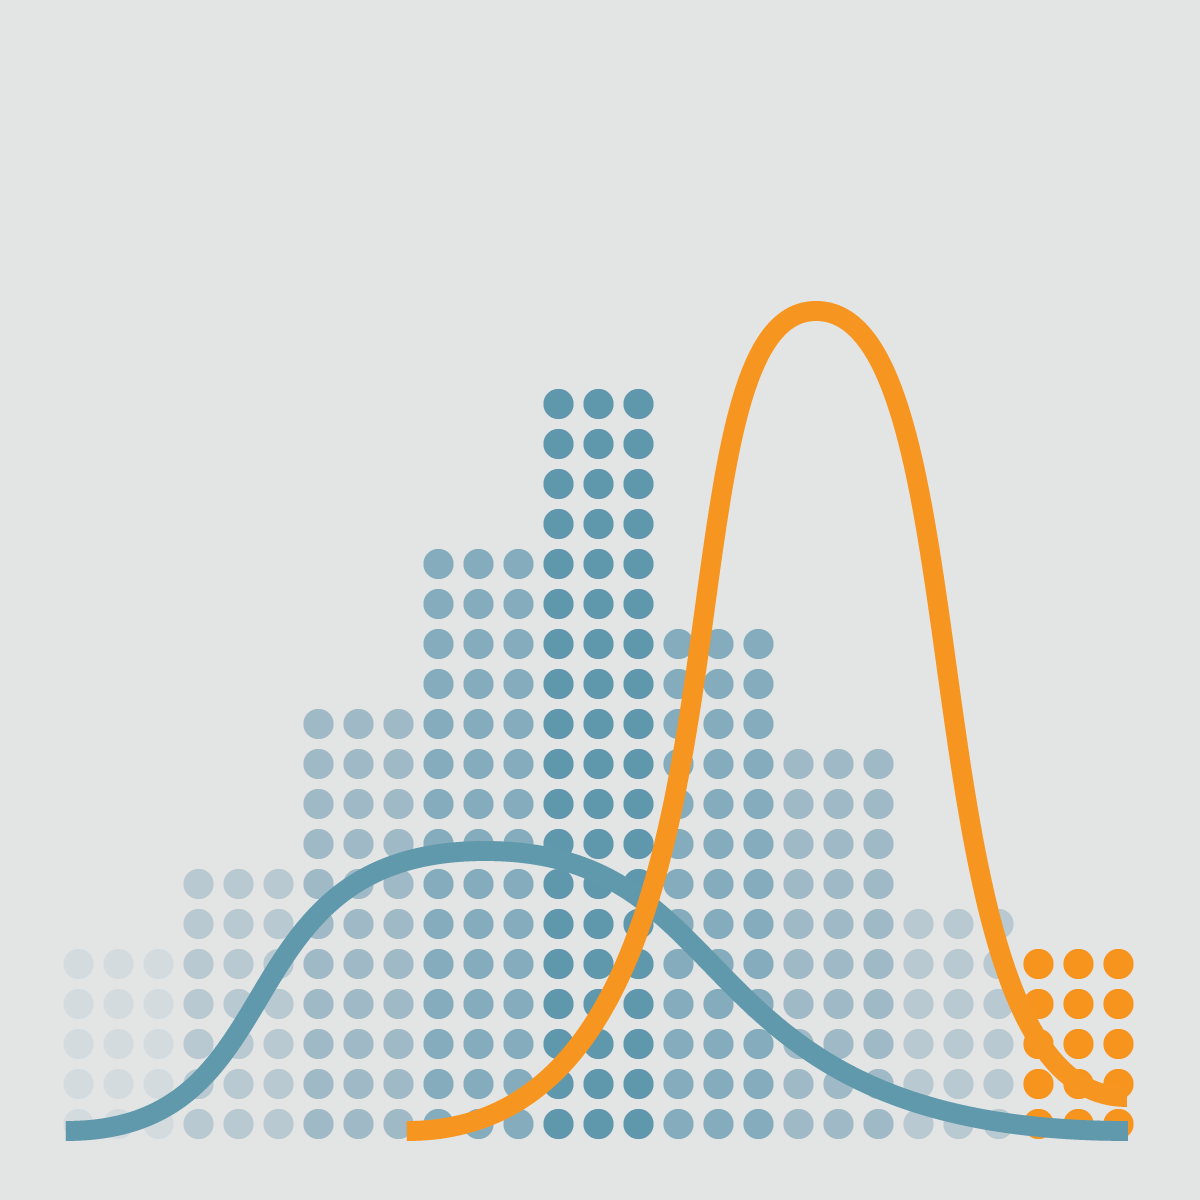 Bayesian Statistics course image